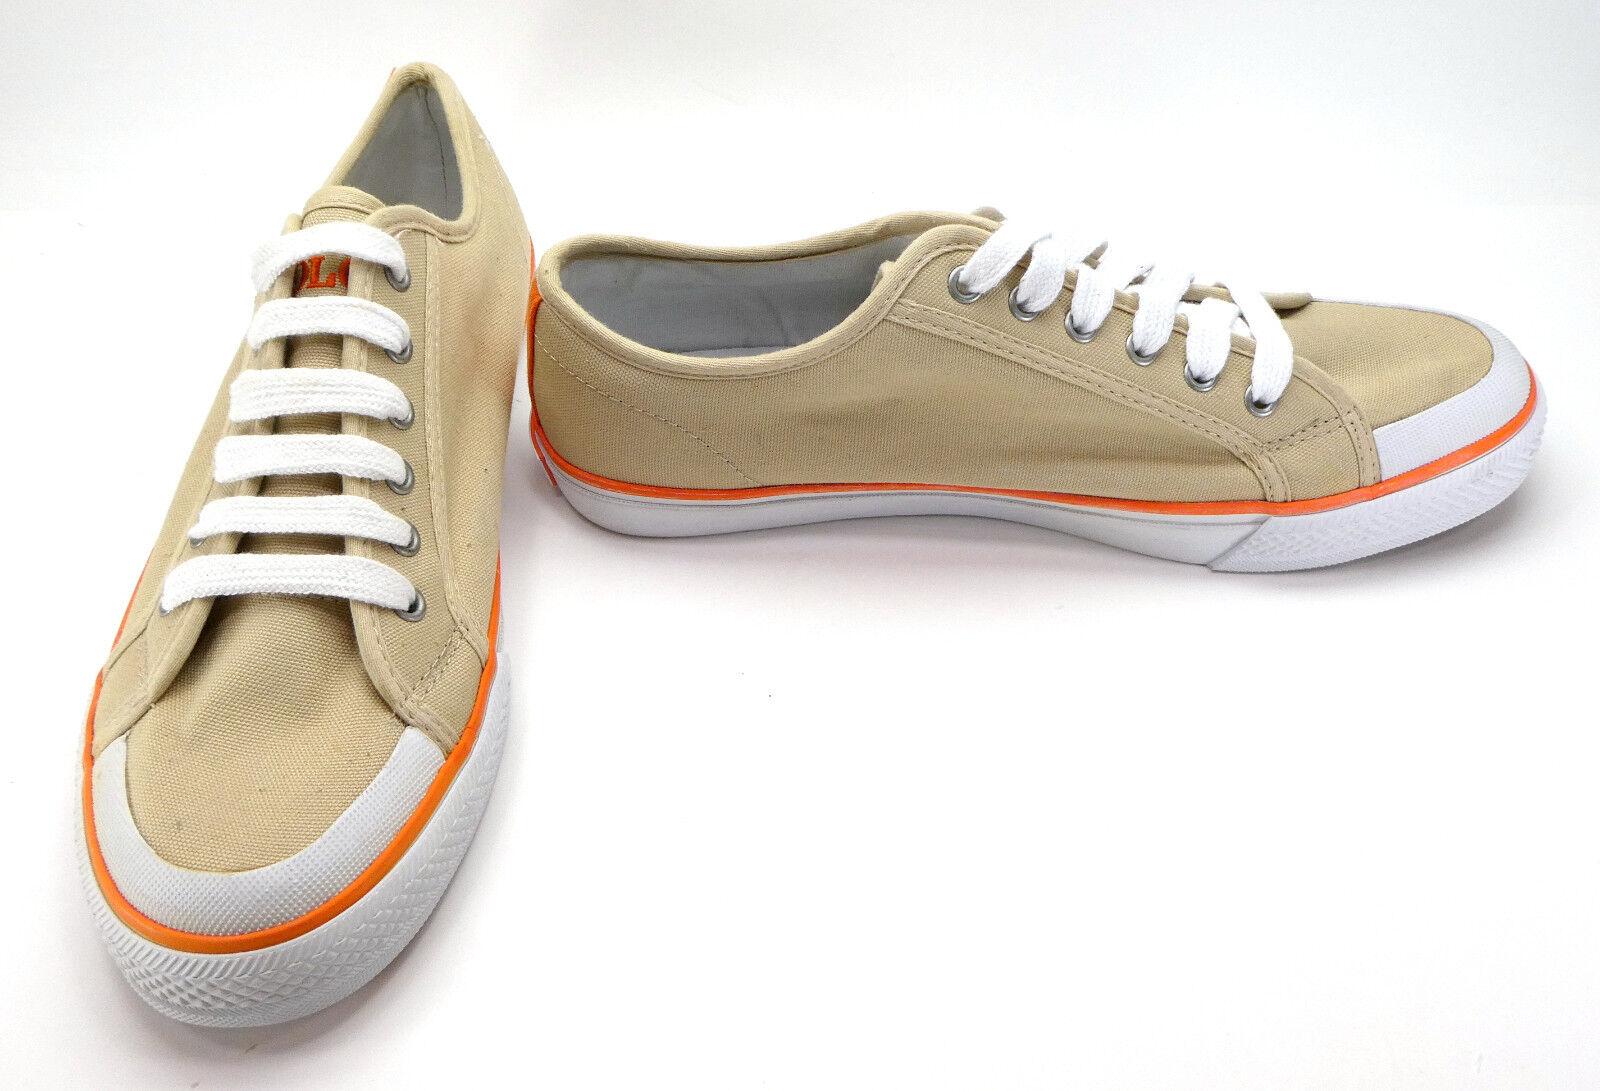 Polo Ralph Lauren shoes Chancery Canvas Low Khaki Tan orange Sneakers Size 10.5